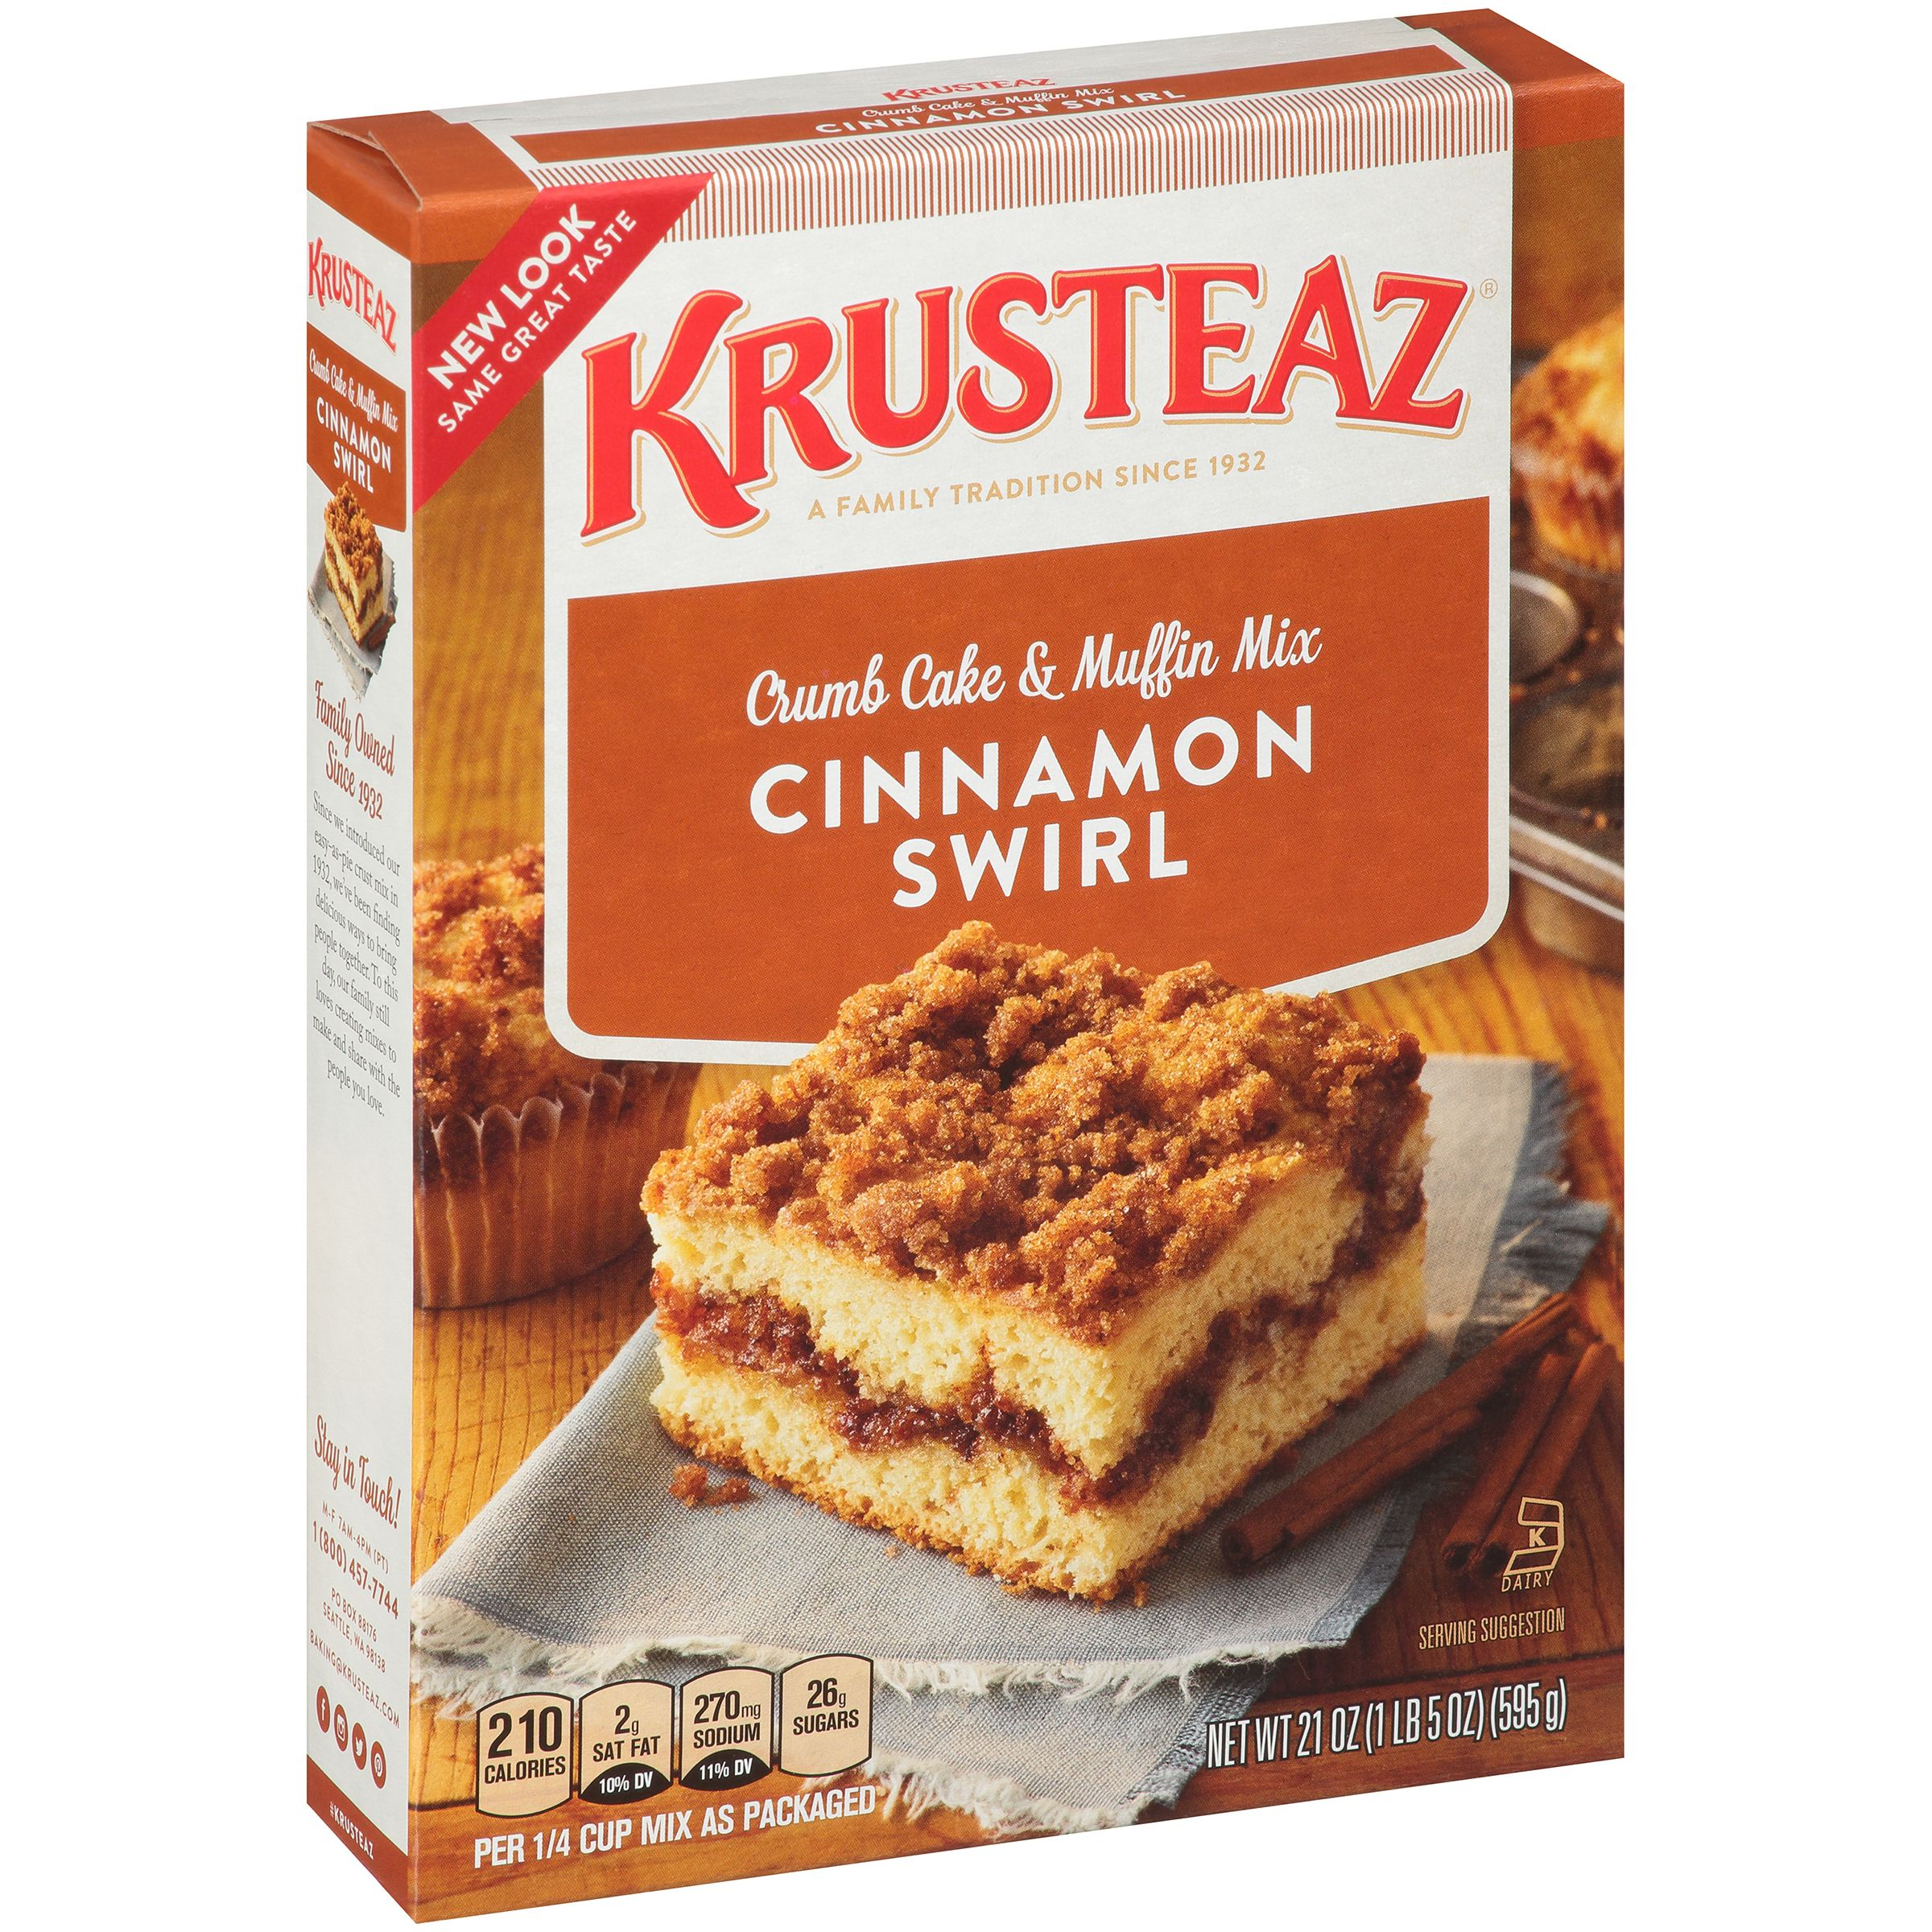 Krusteaz Cinnamon Crumb Cake Supreme Mix, 21 oz by Continental Mills, Inc.